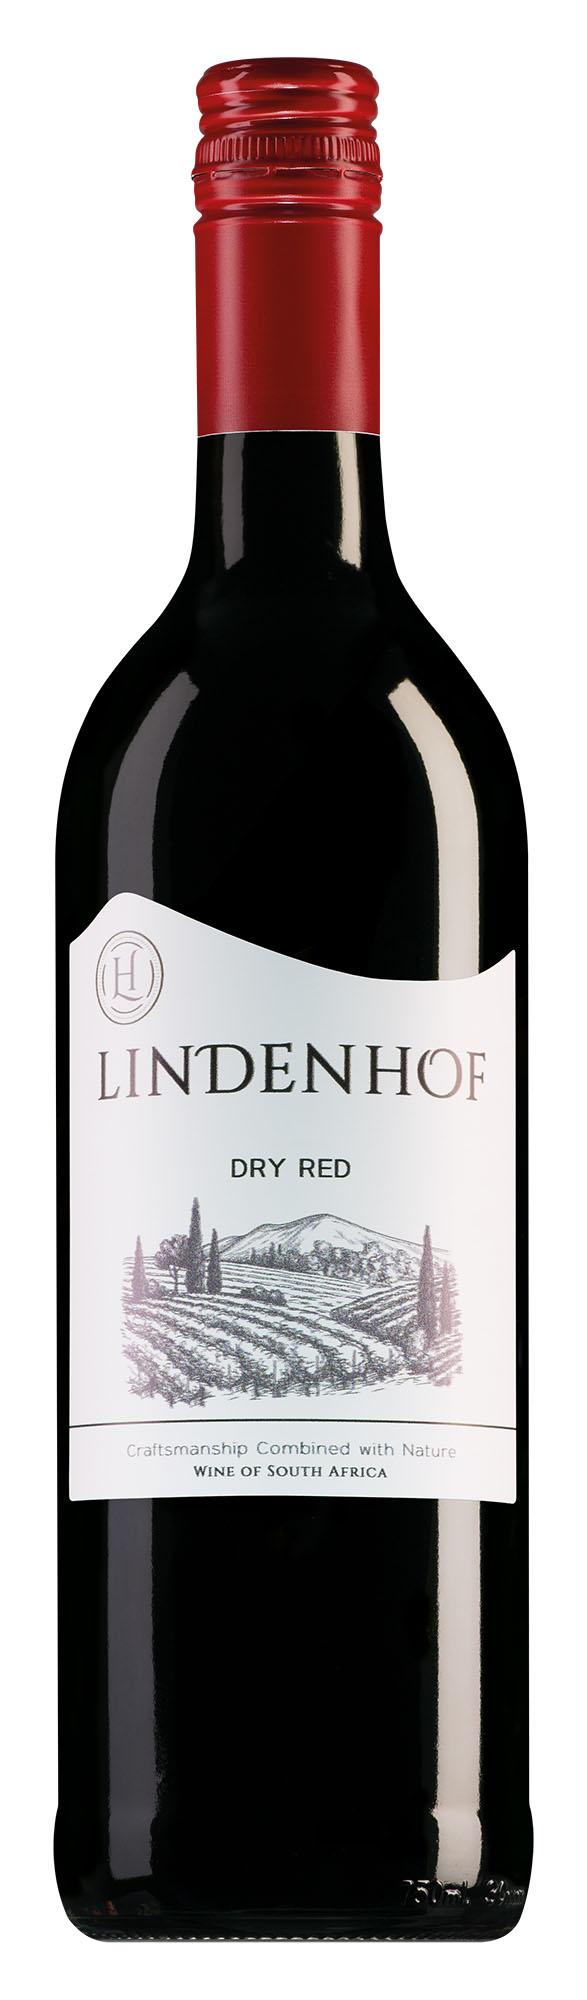 Lindenhof Paarl Dry Red